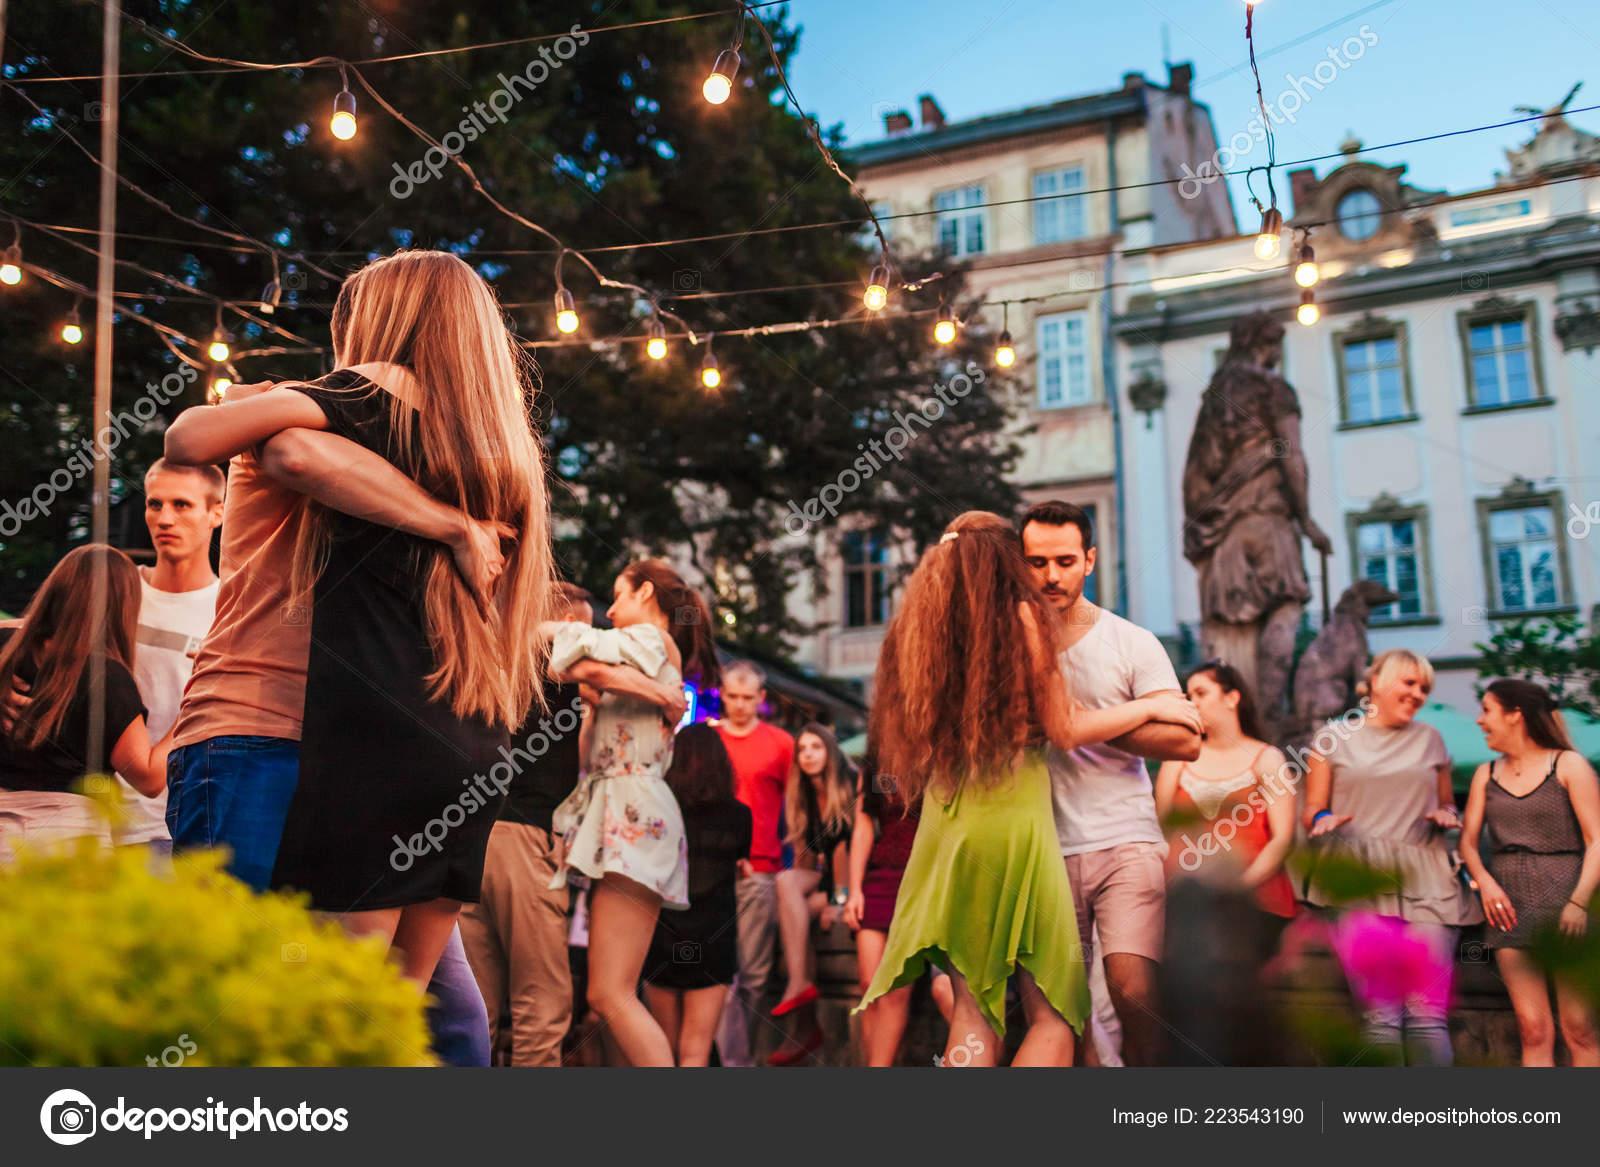 Lviv Ukraine August 2018 People Dancing Salsa Bachata